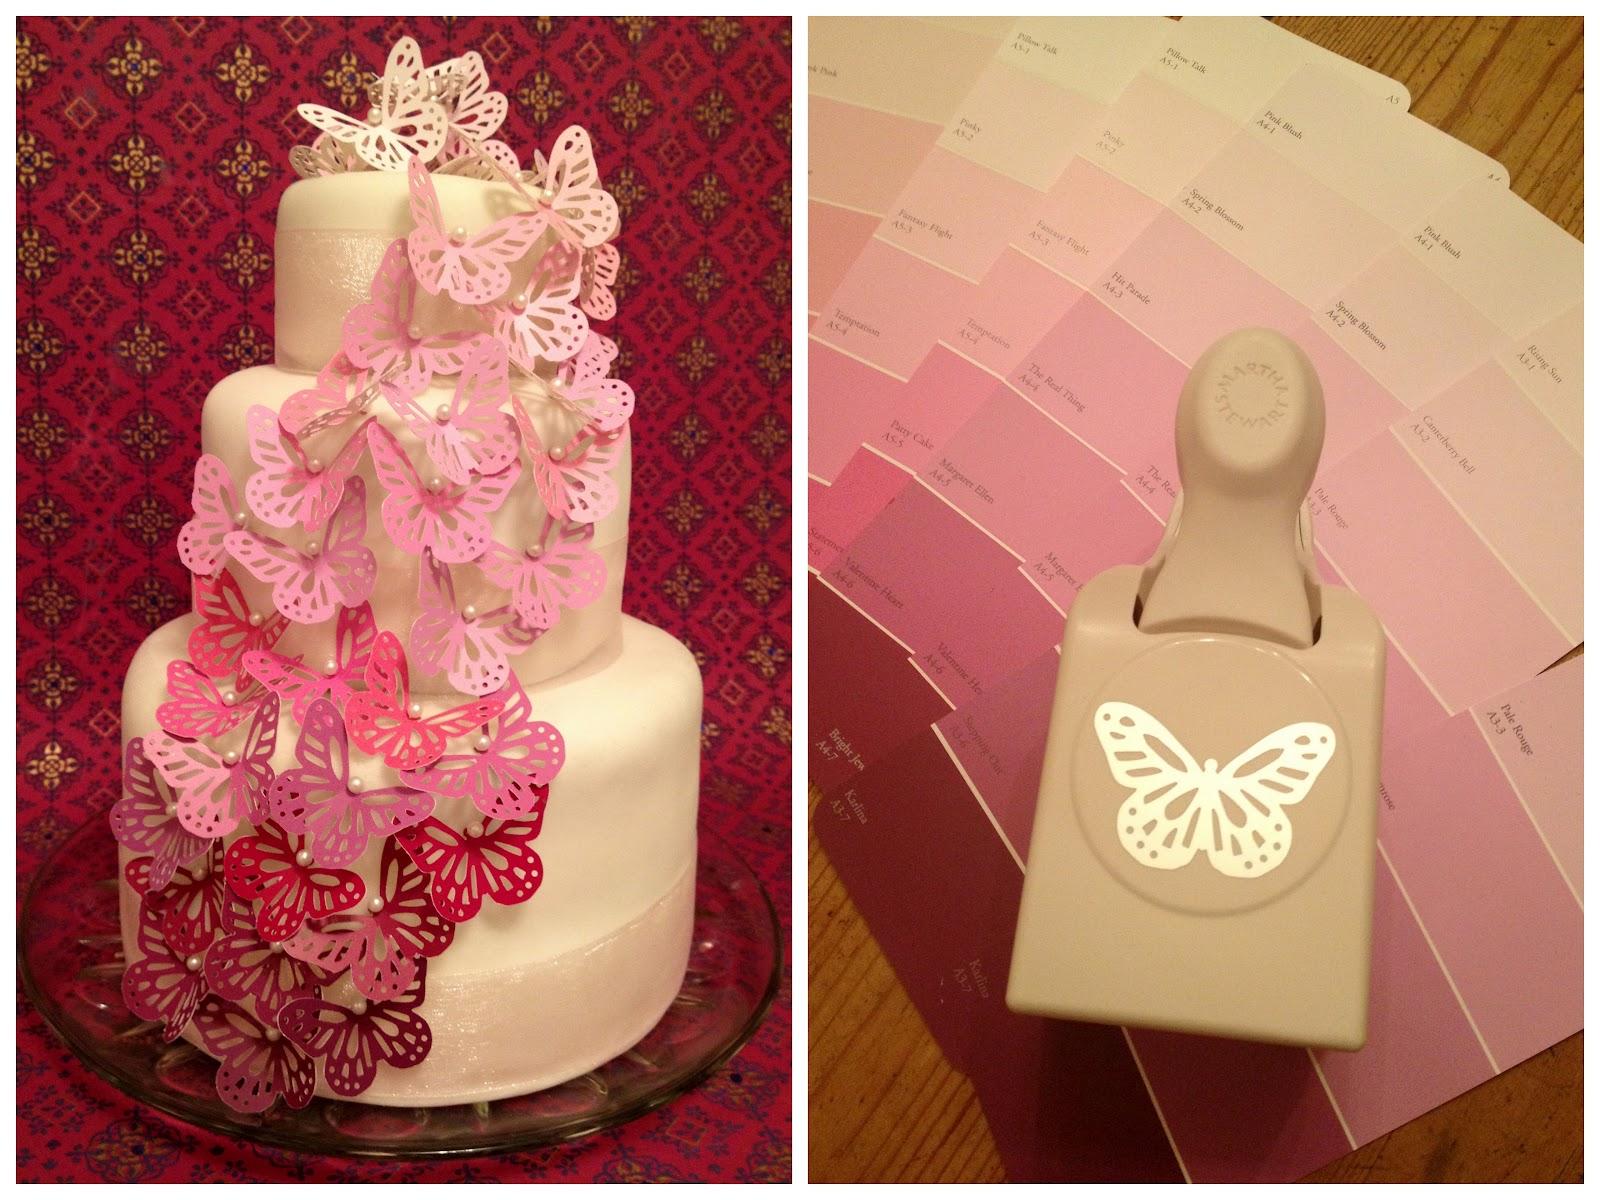 Simple Diy Cake Decoration : *Jennuine by Rook No. 17*: Easy & Elegant Wedding Cake You ...